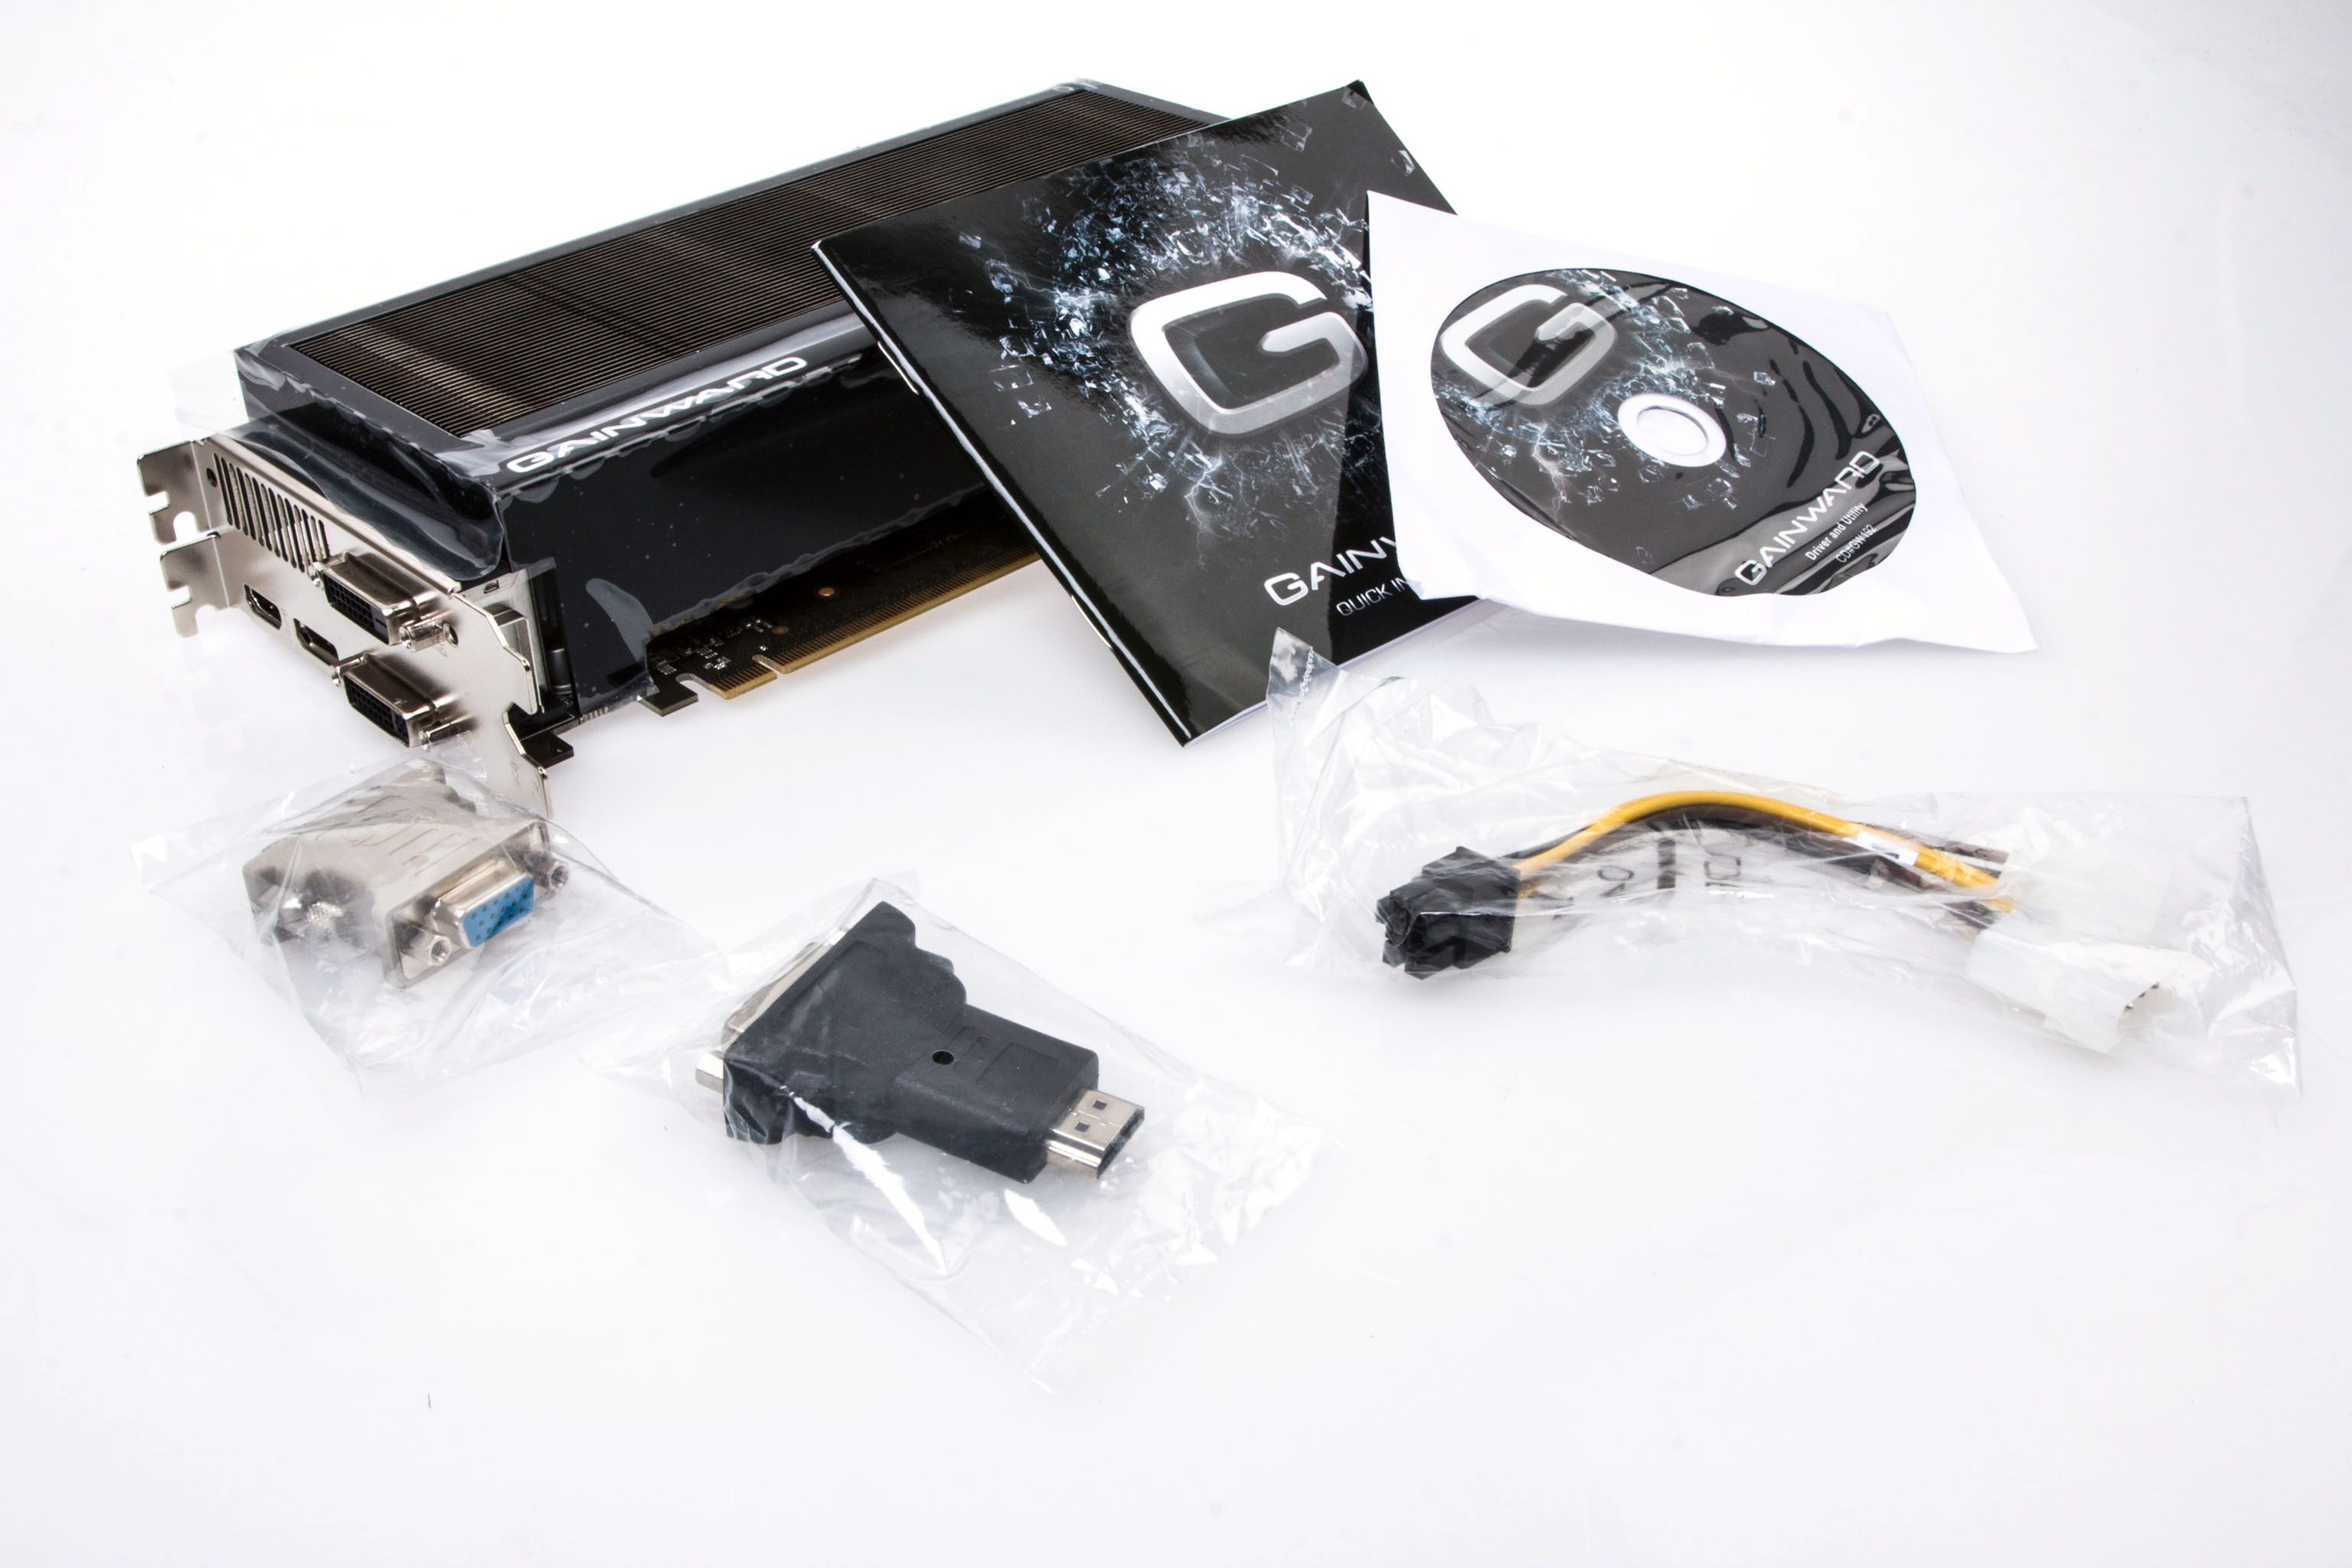 Gainward legger blant annet med en HDMI-til-DVI-overgang i sin pakke.Foto: Varg Aamo, Hardware.no